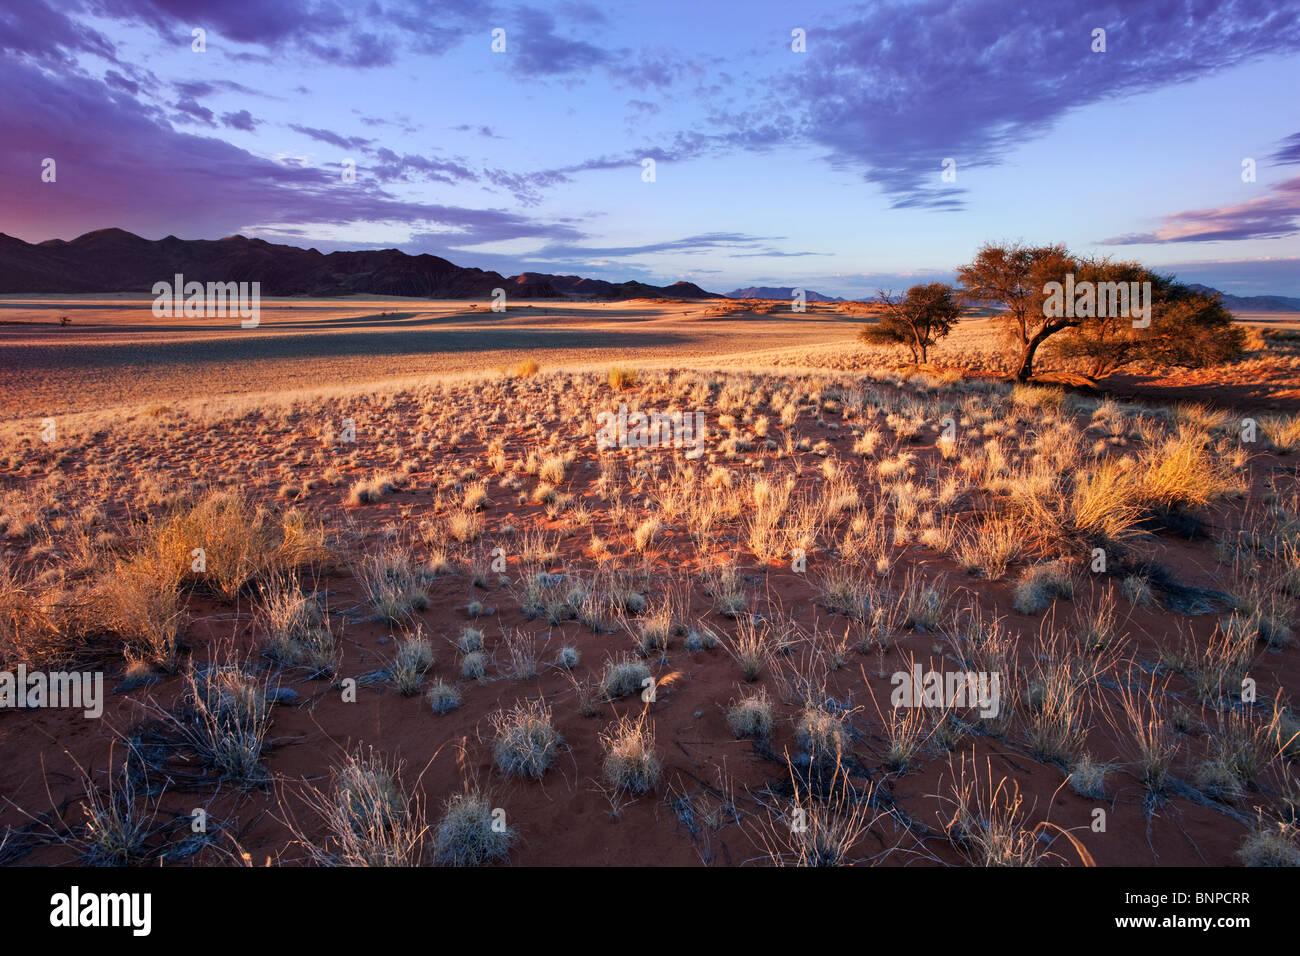 Puesta de sol ilumina el paisaje único de sur-oeste del desierto de Namib o pro-Namib. NamibRand Nature Reserve, Imagen De Stock